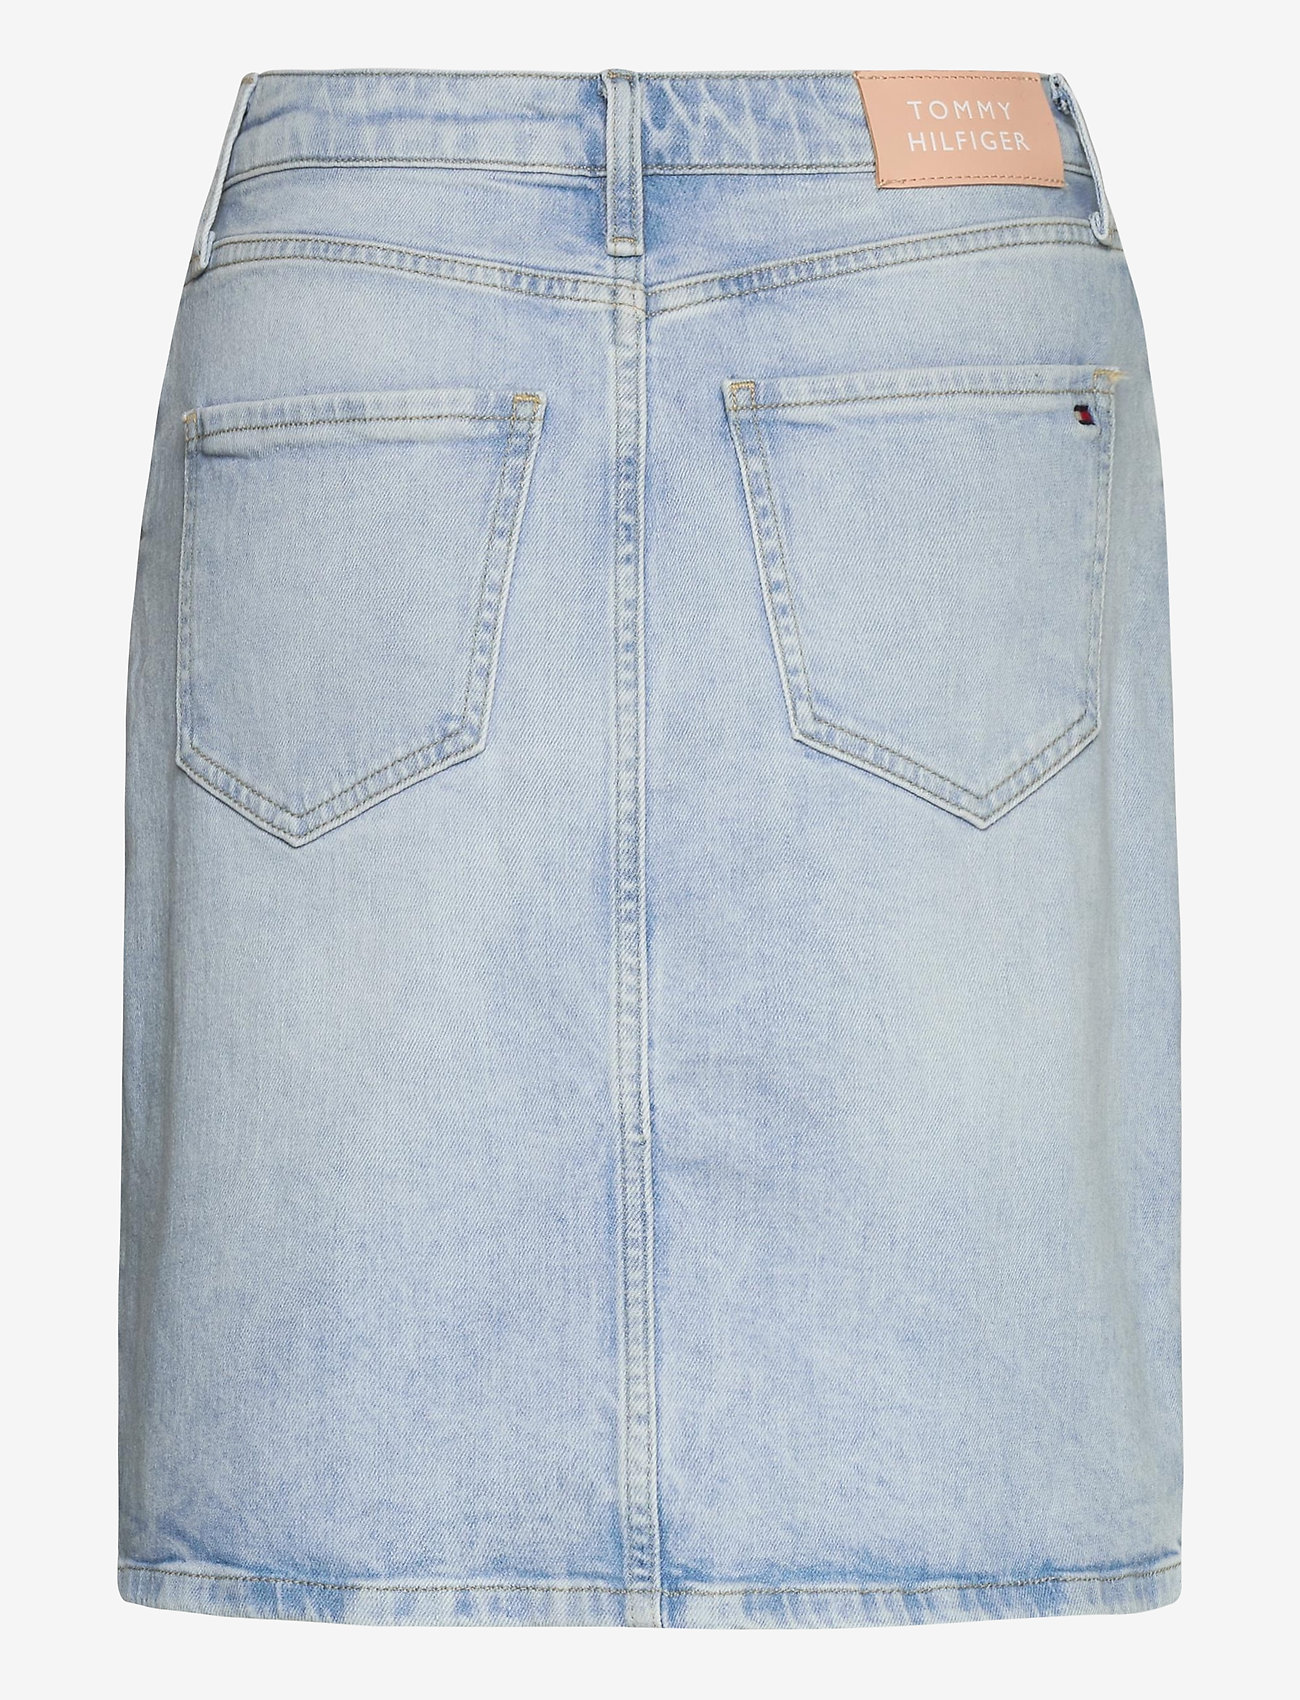 Tommy Hilfiger - ROME STRAIGHT HW SKIRT LOTA - jupes en jeans - lota - 1